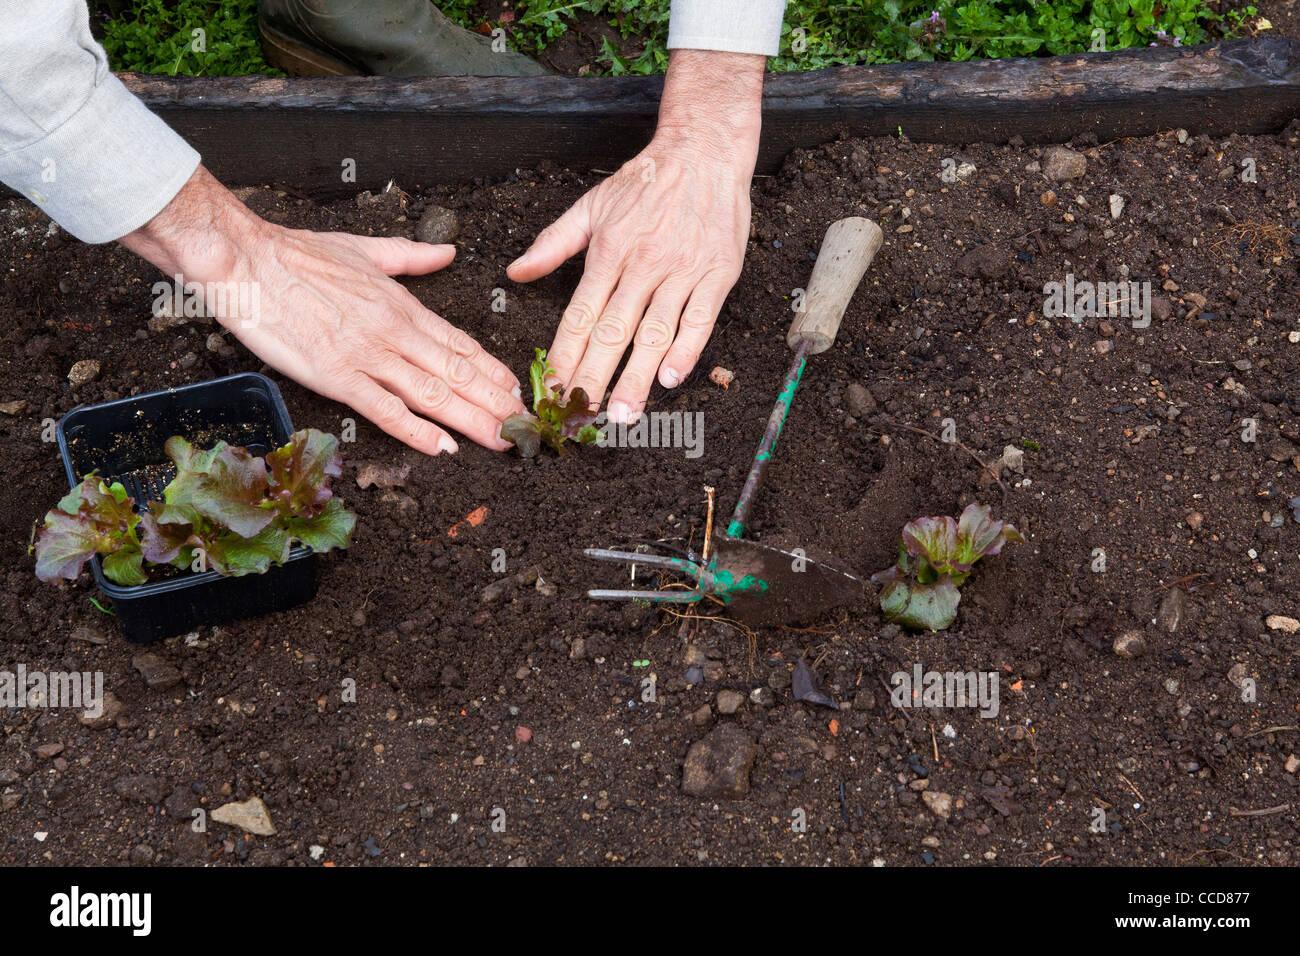 Transplant lettuce, step 4, you press the ground lightly